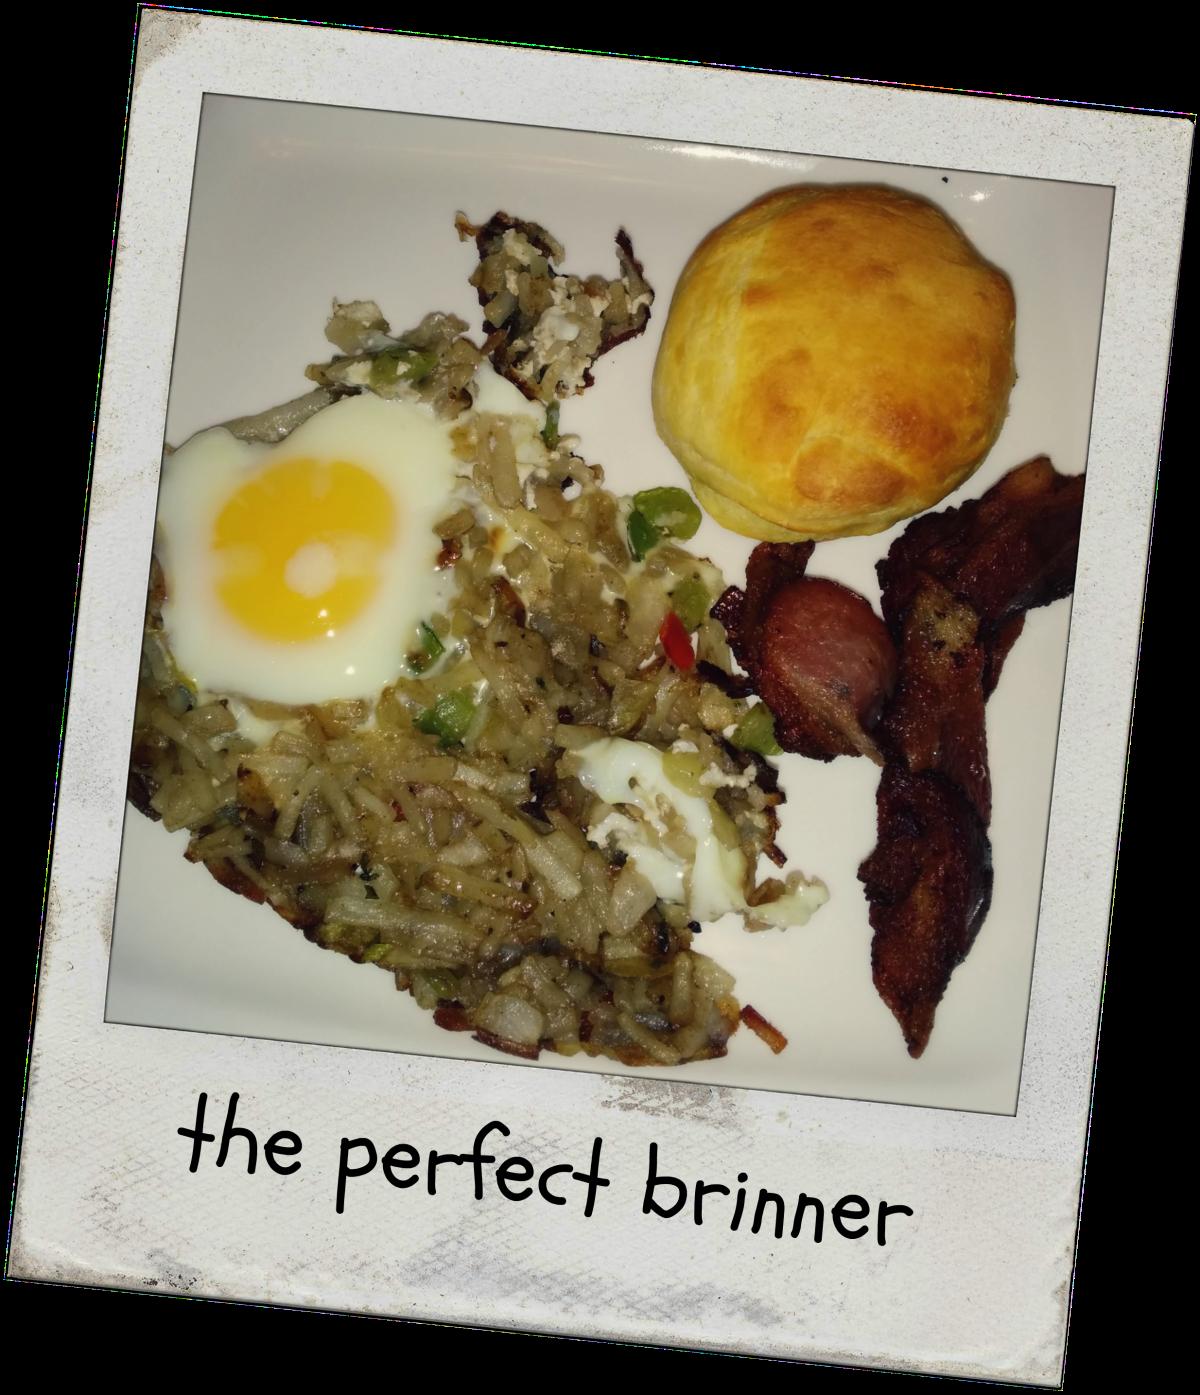 theperfectbrinner